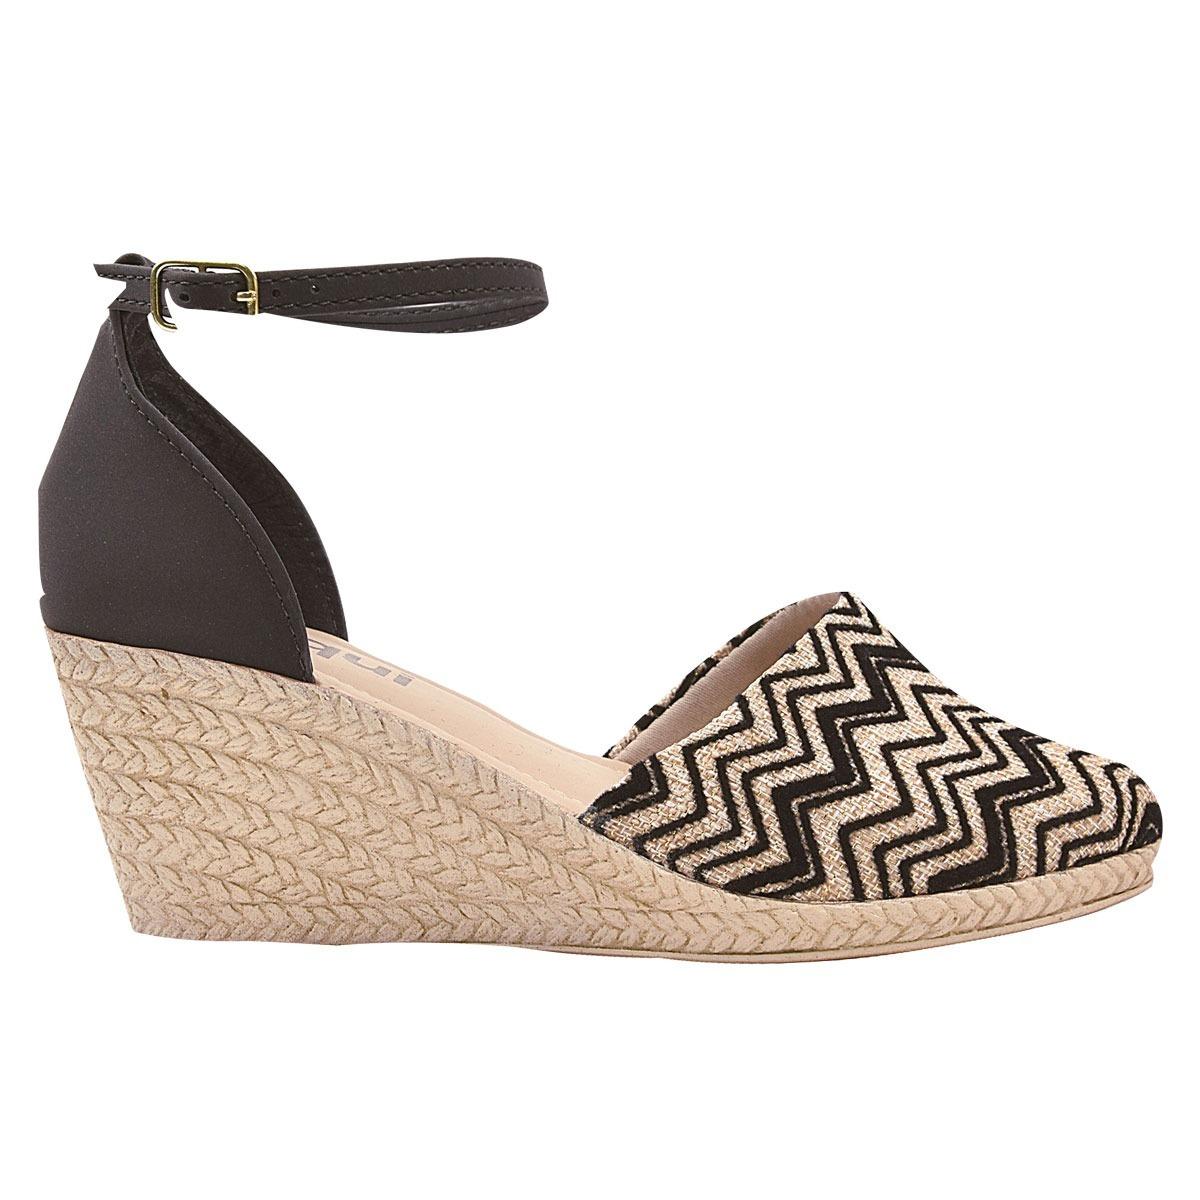 efa56eff9 sandalia sapato feminina anabela salto alto tratorada snp. Carregando zoom.